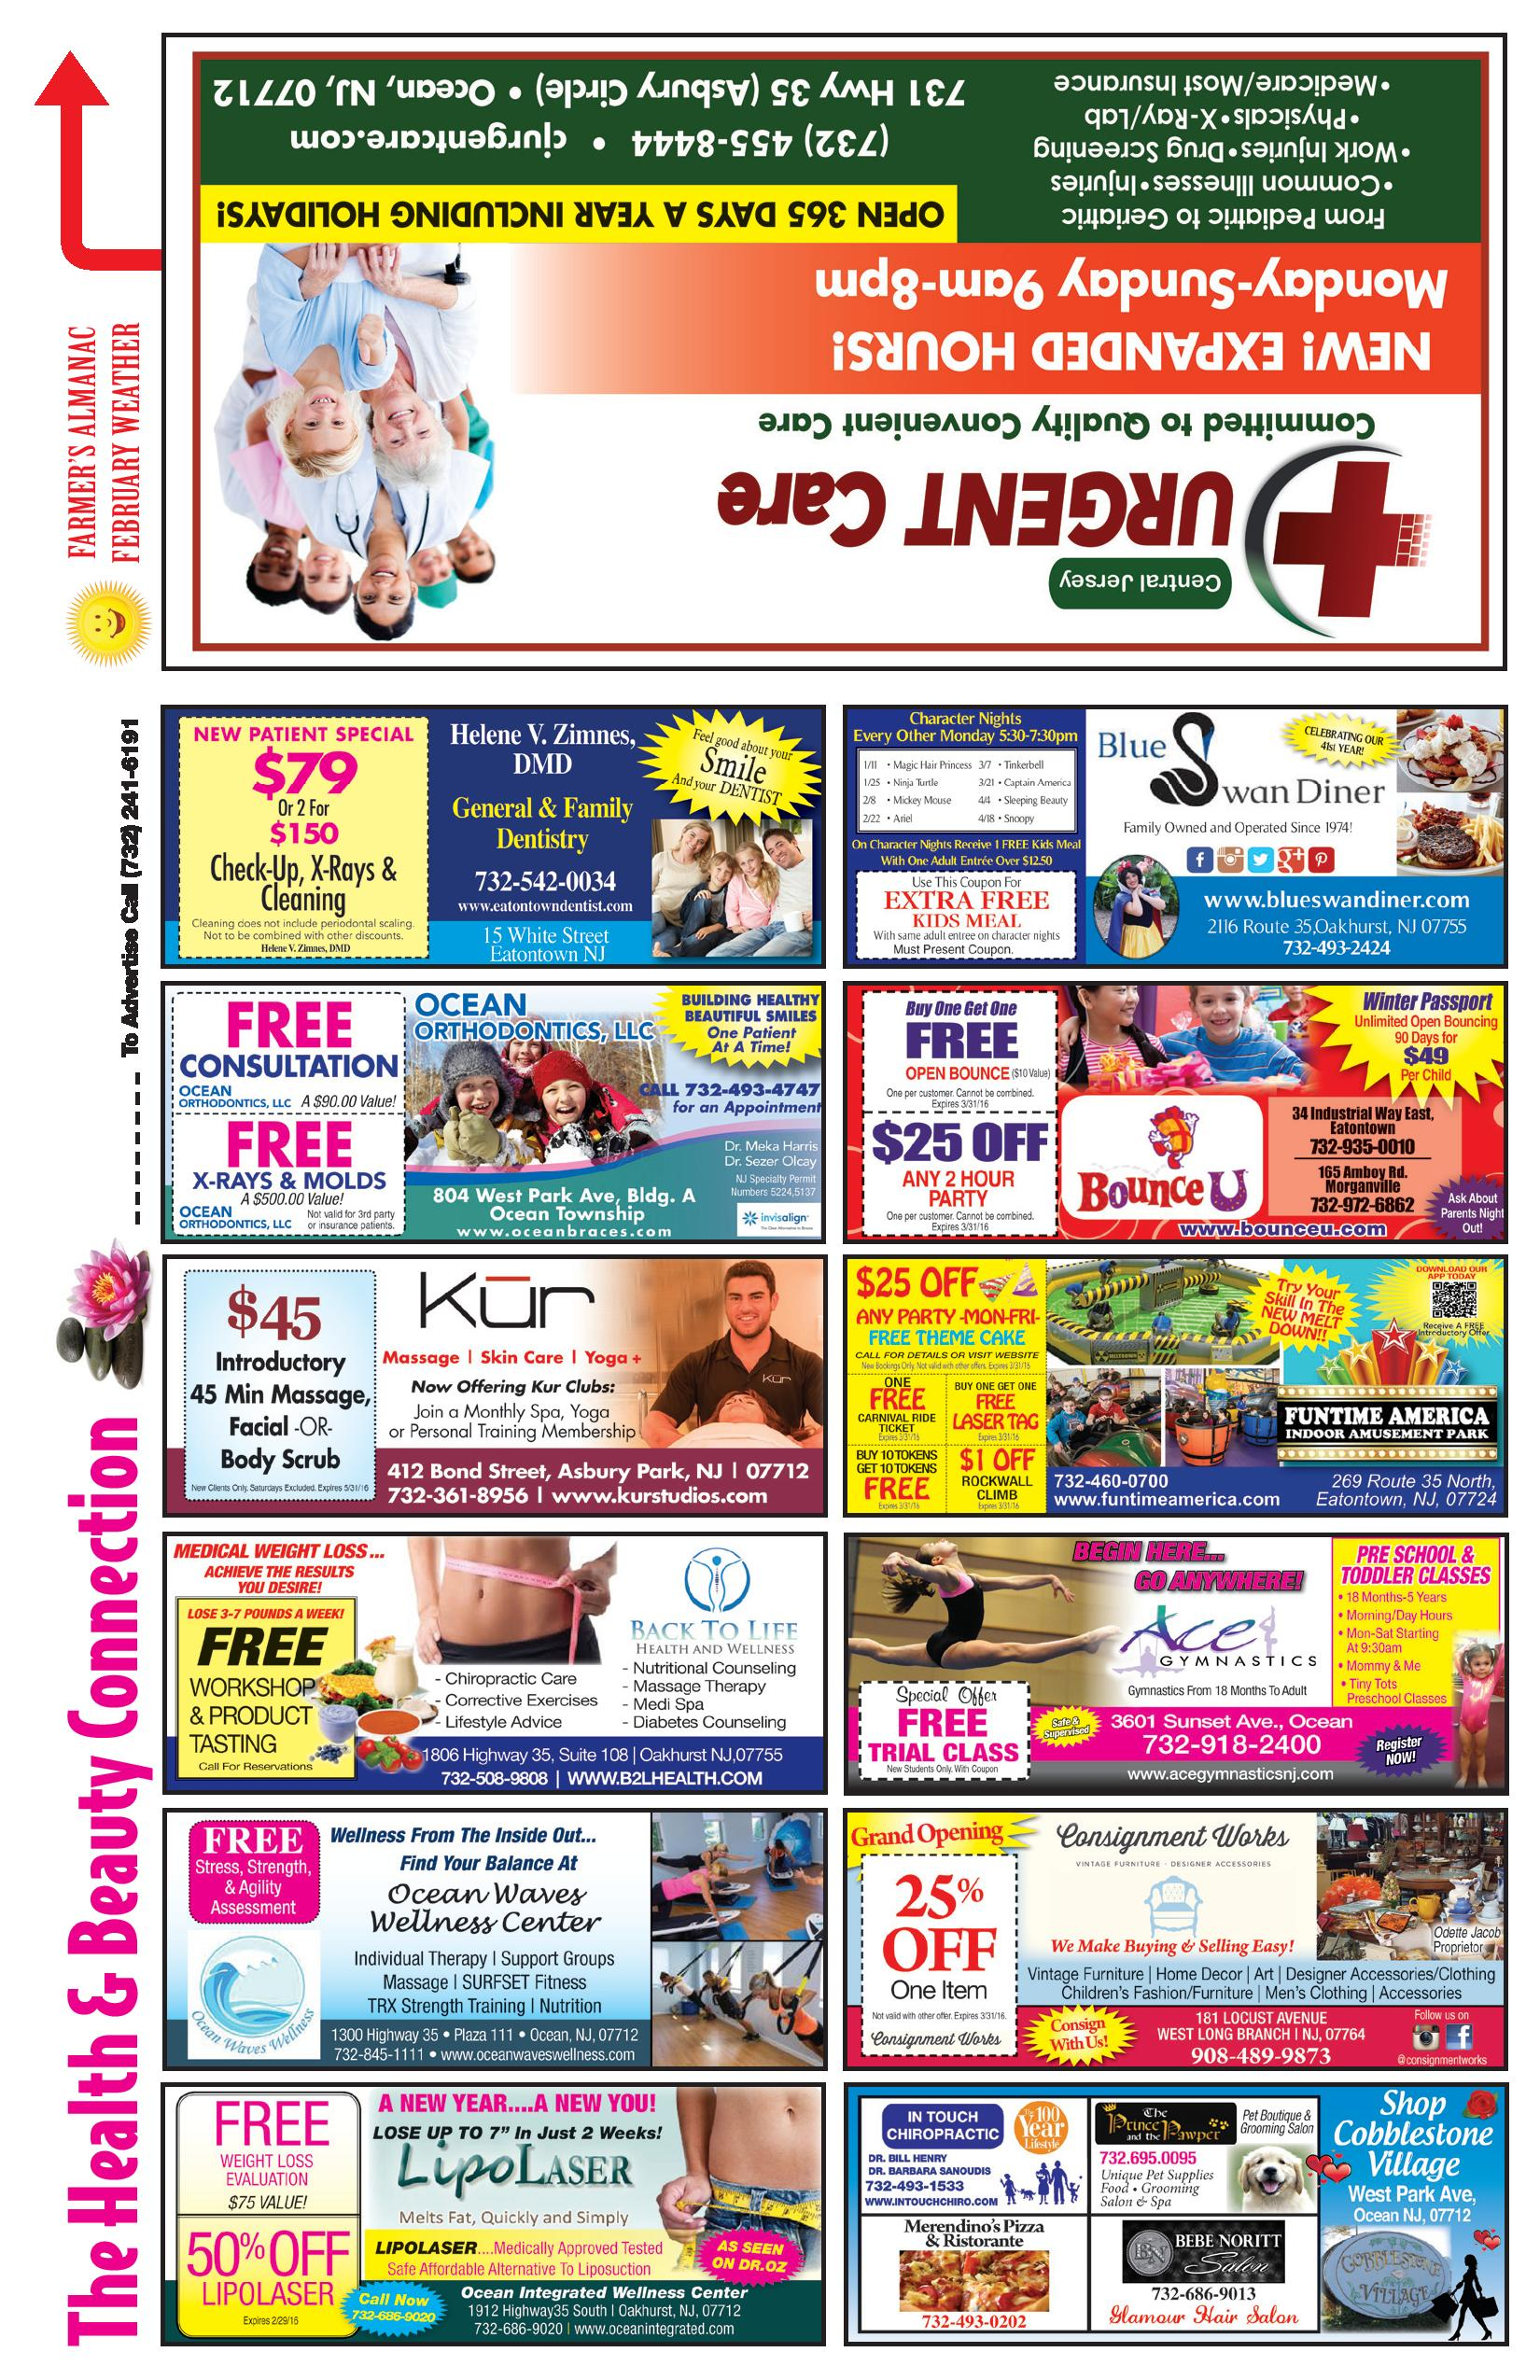 53 Joy Betesh_11x17_PROOF-page-002